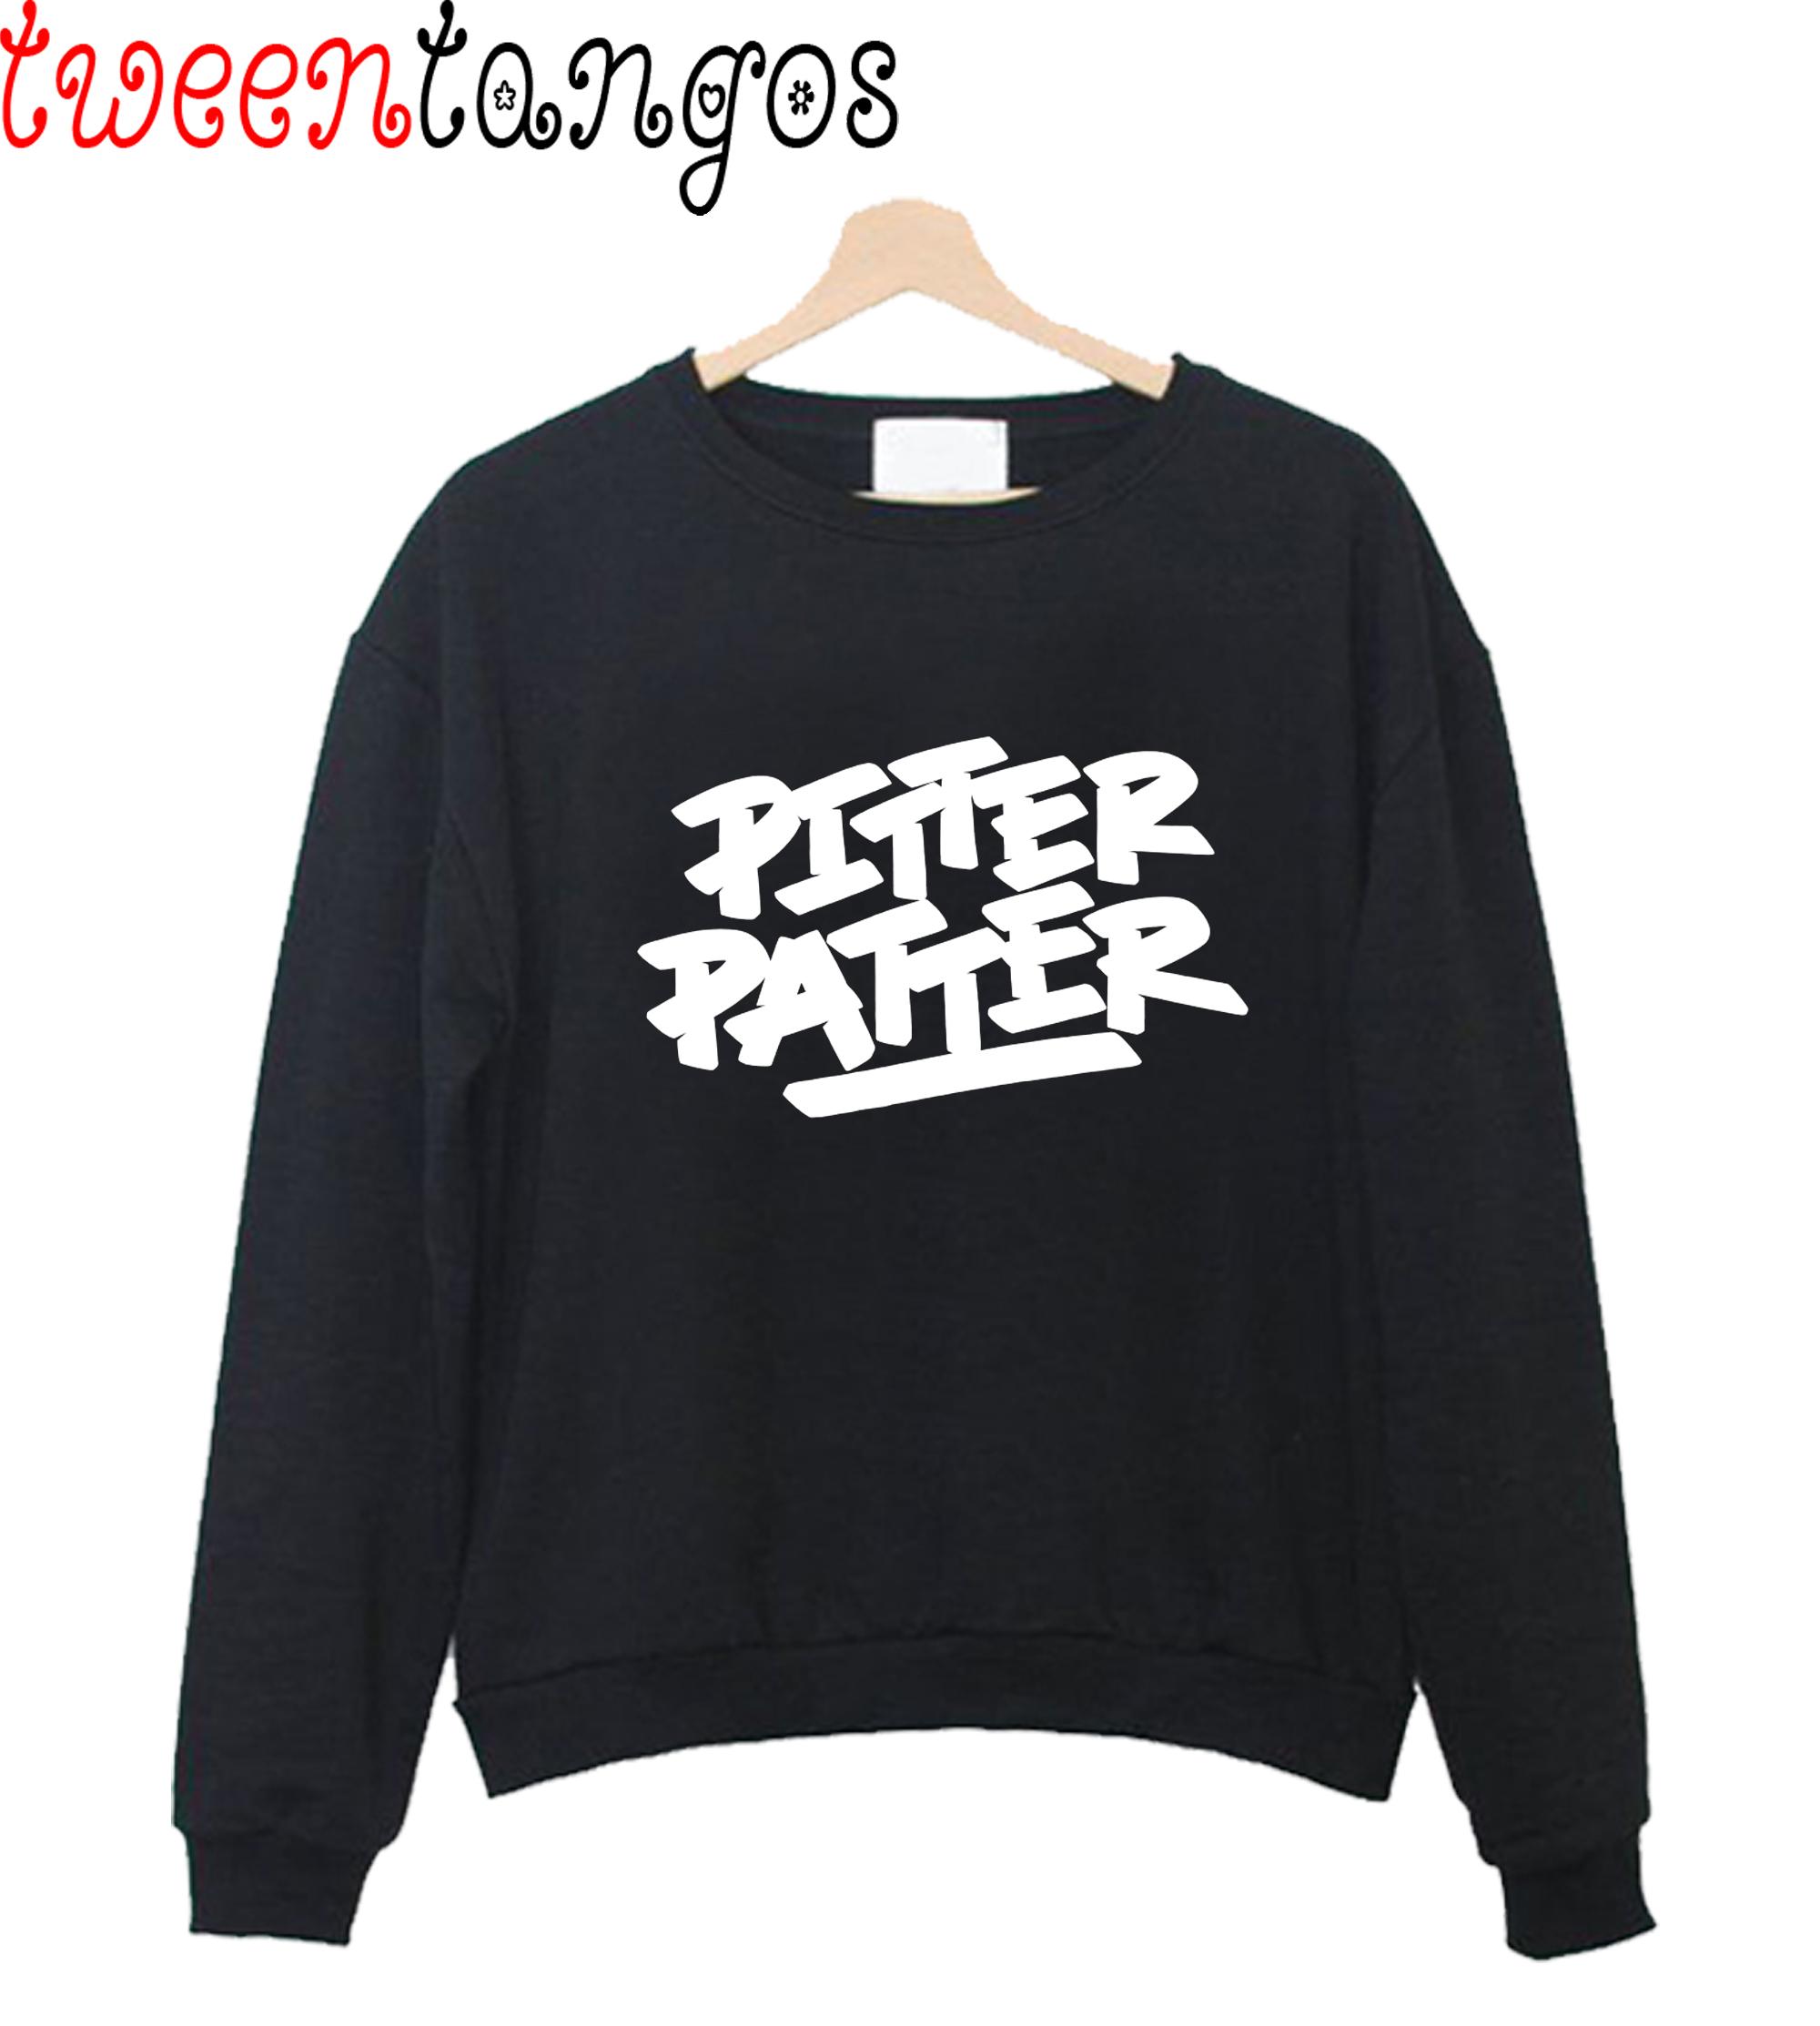 Pitter Patter Sweatshirt